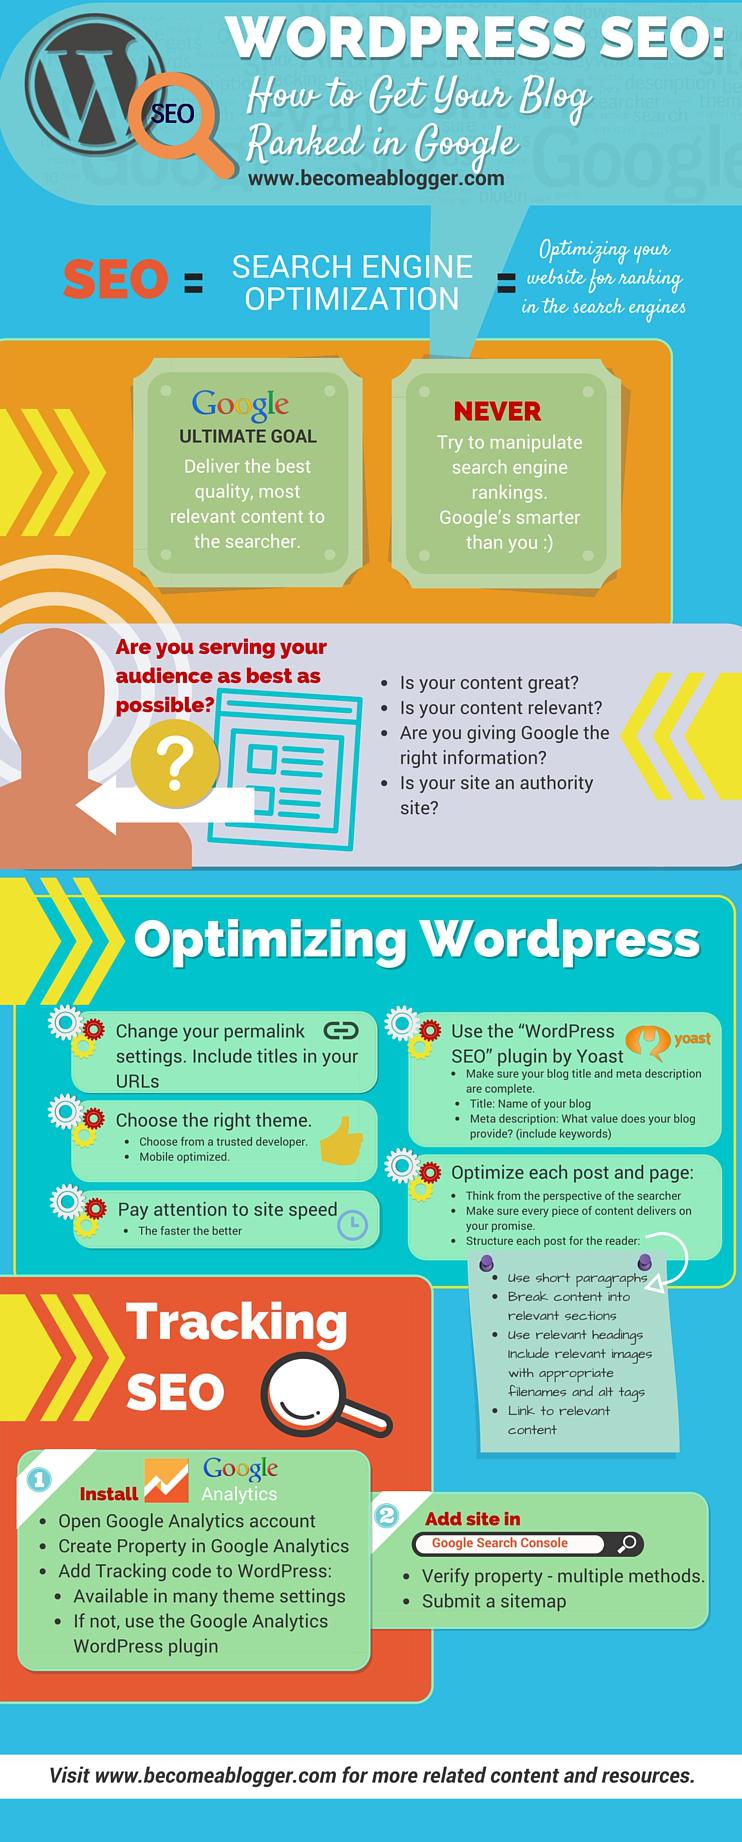 234_Wordpress_SEO_Infographic